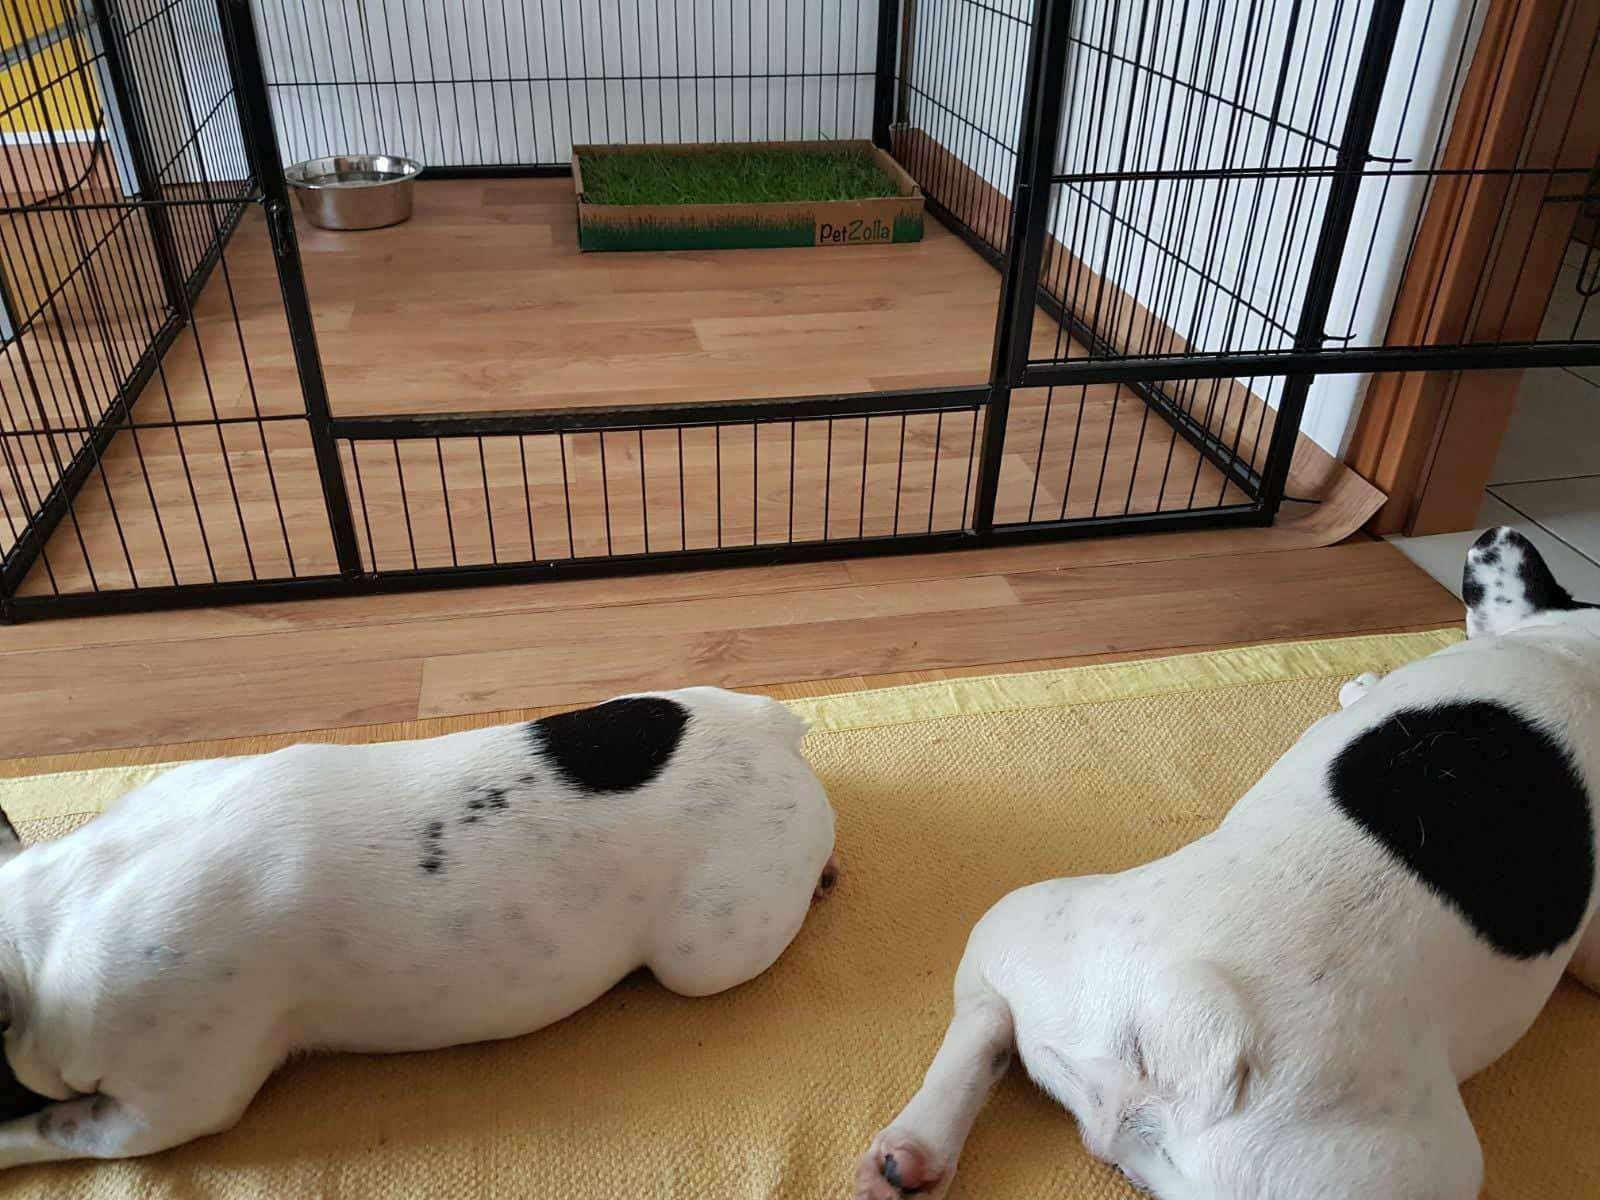 Recinti per cani da interno recinto per cani da interno la for Cancelletti per cani da esterno